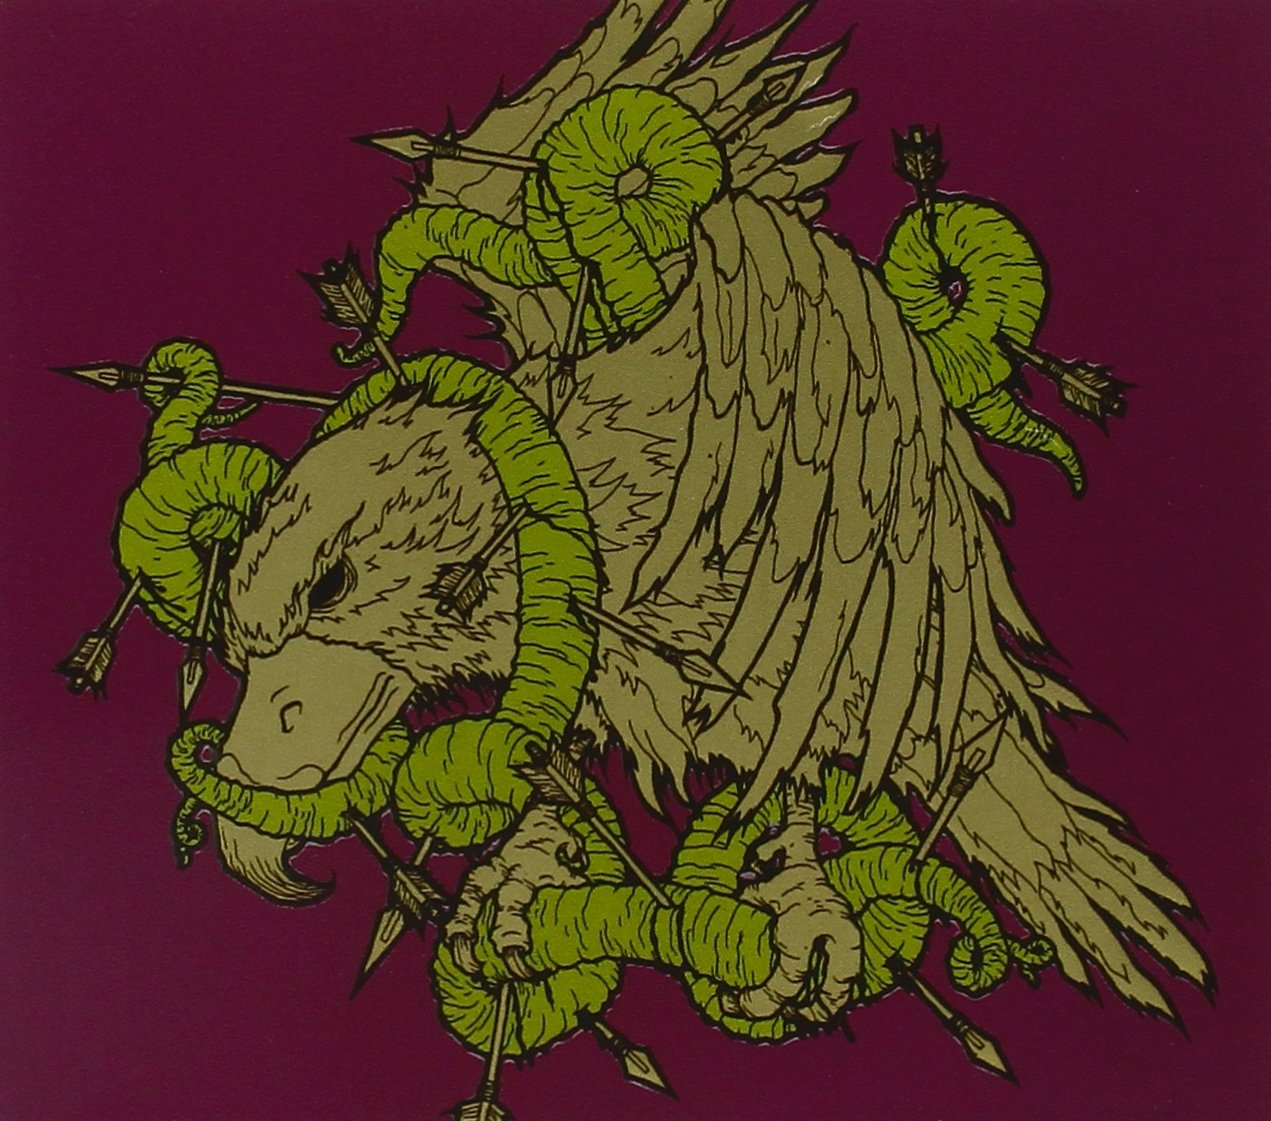 Zozobra - Bird of Prey (2008) [FLAC] Download